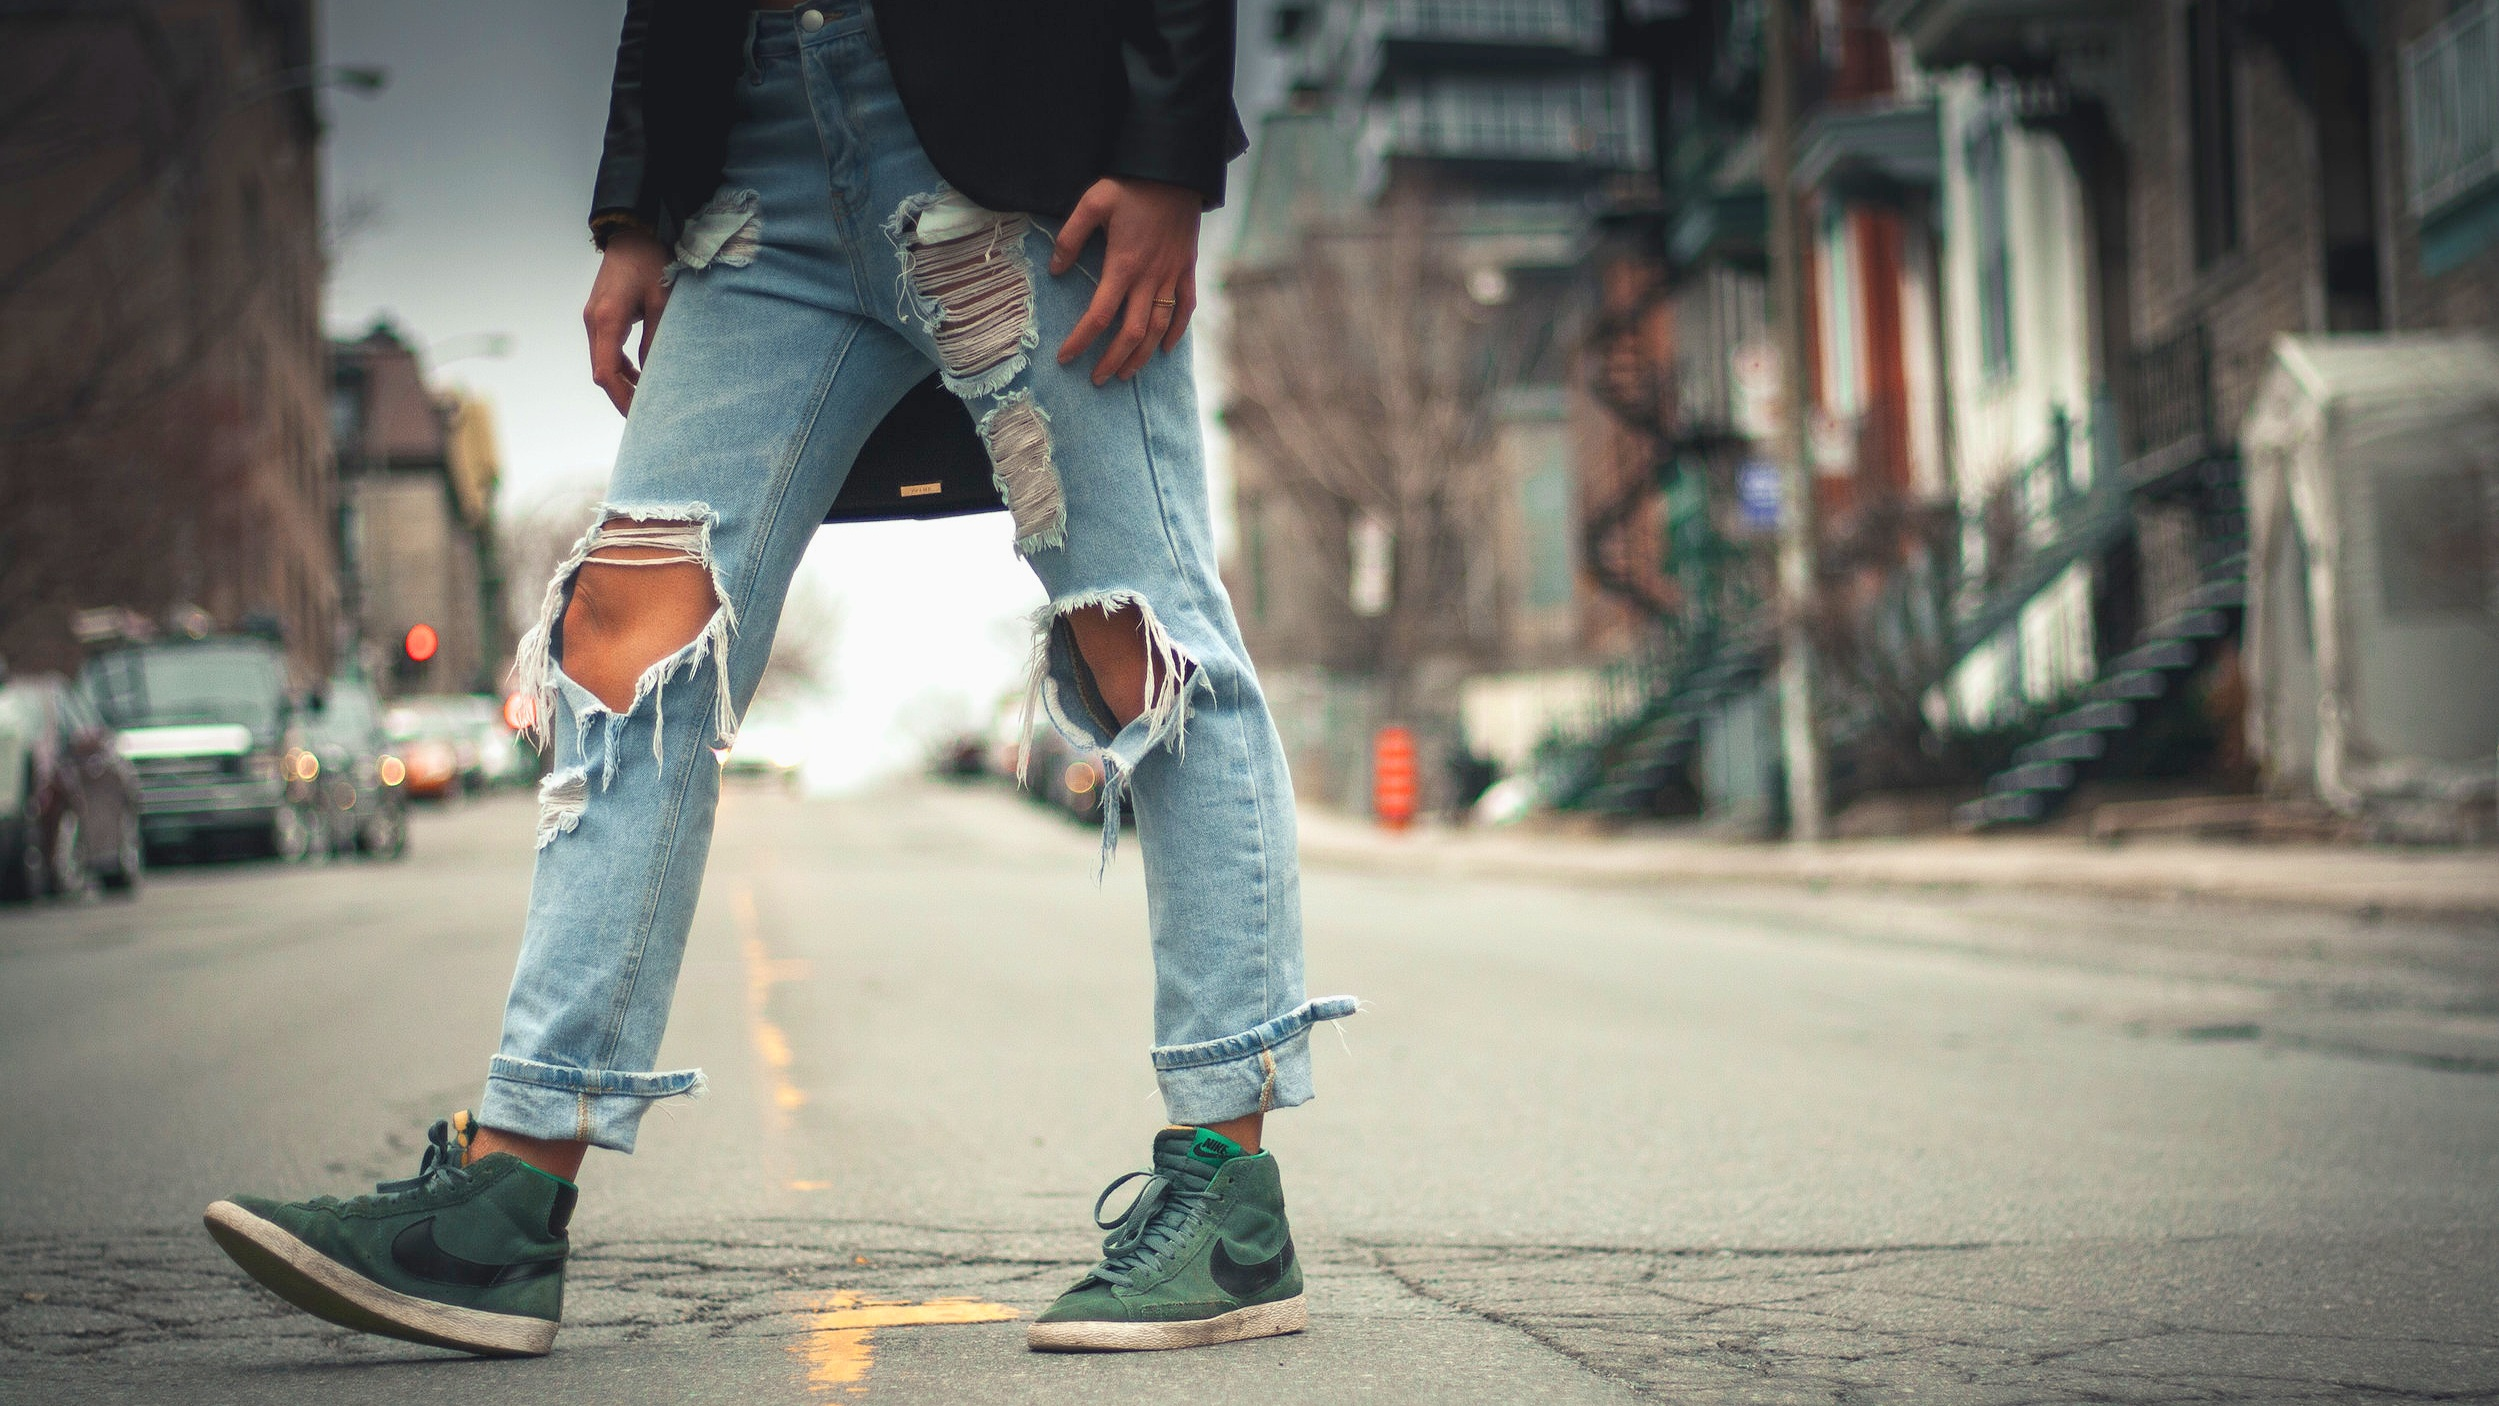 street+photography